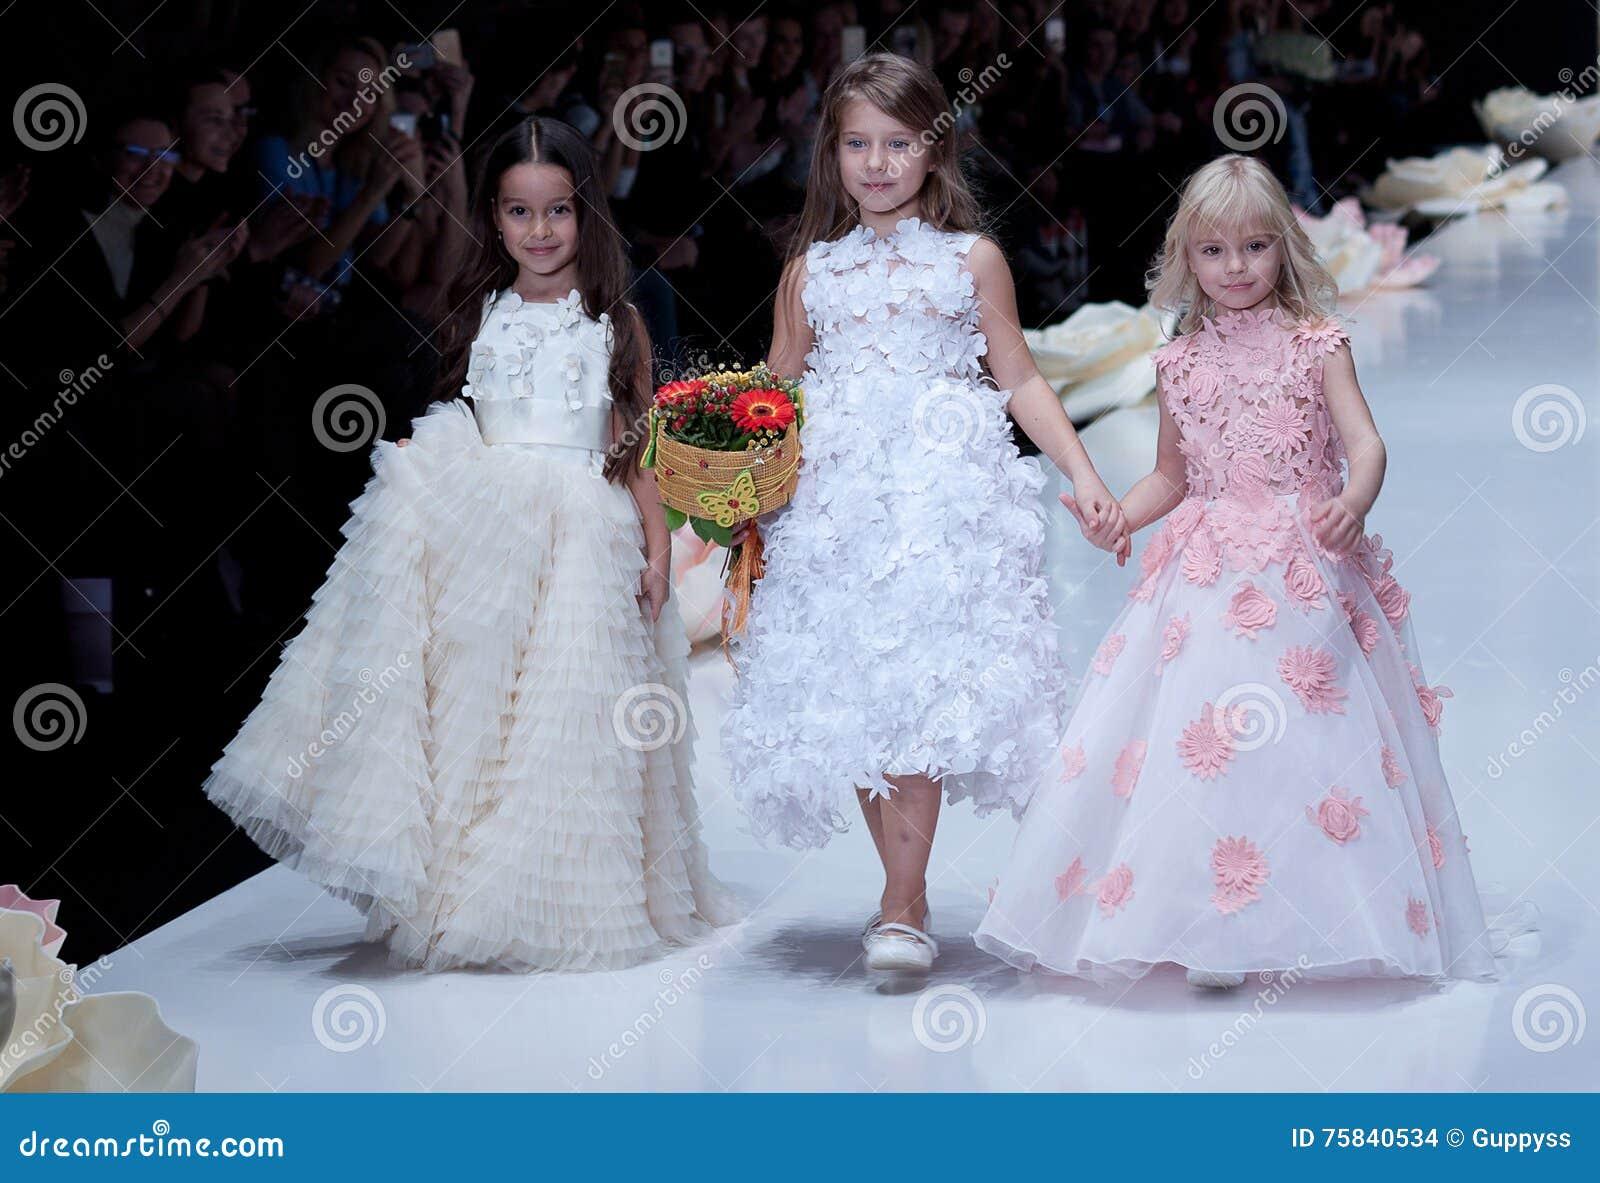 Fashion Show Kids Girsl On Podium Editorial Stock Image Image